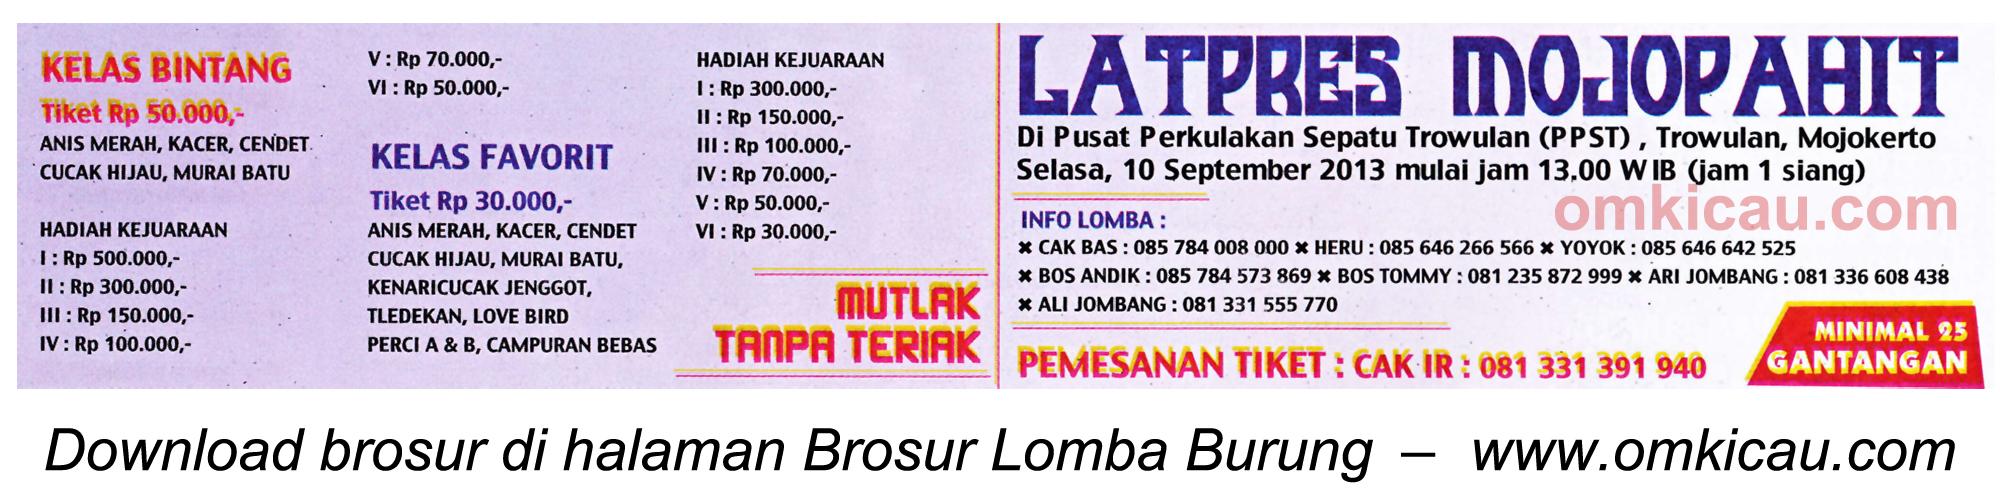 Brosur Latpres Mojopahit, Mojokerto, 10 September 2013